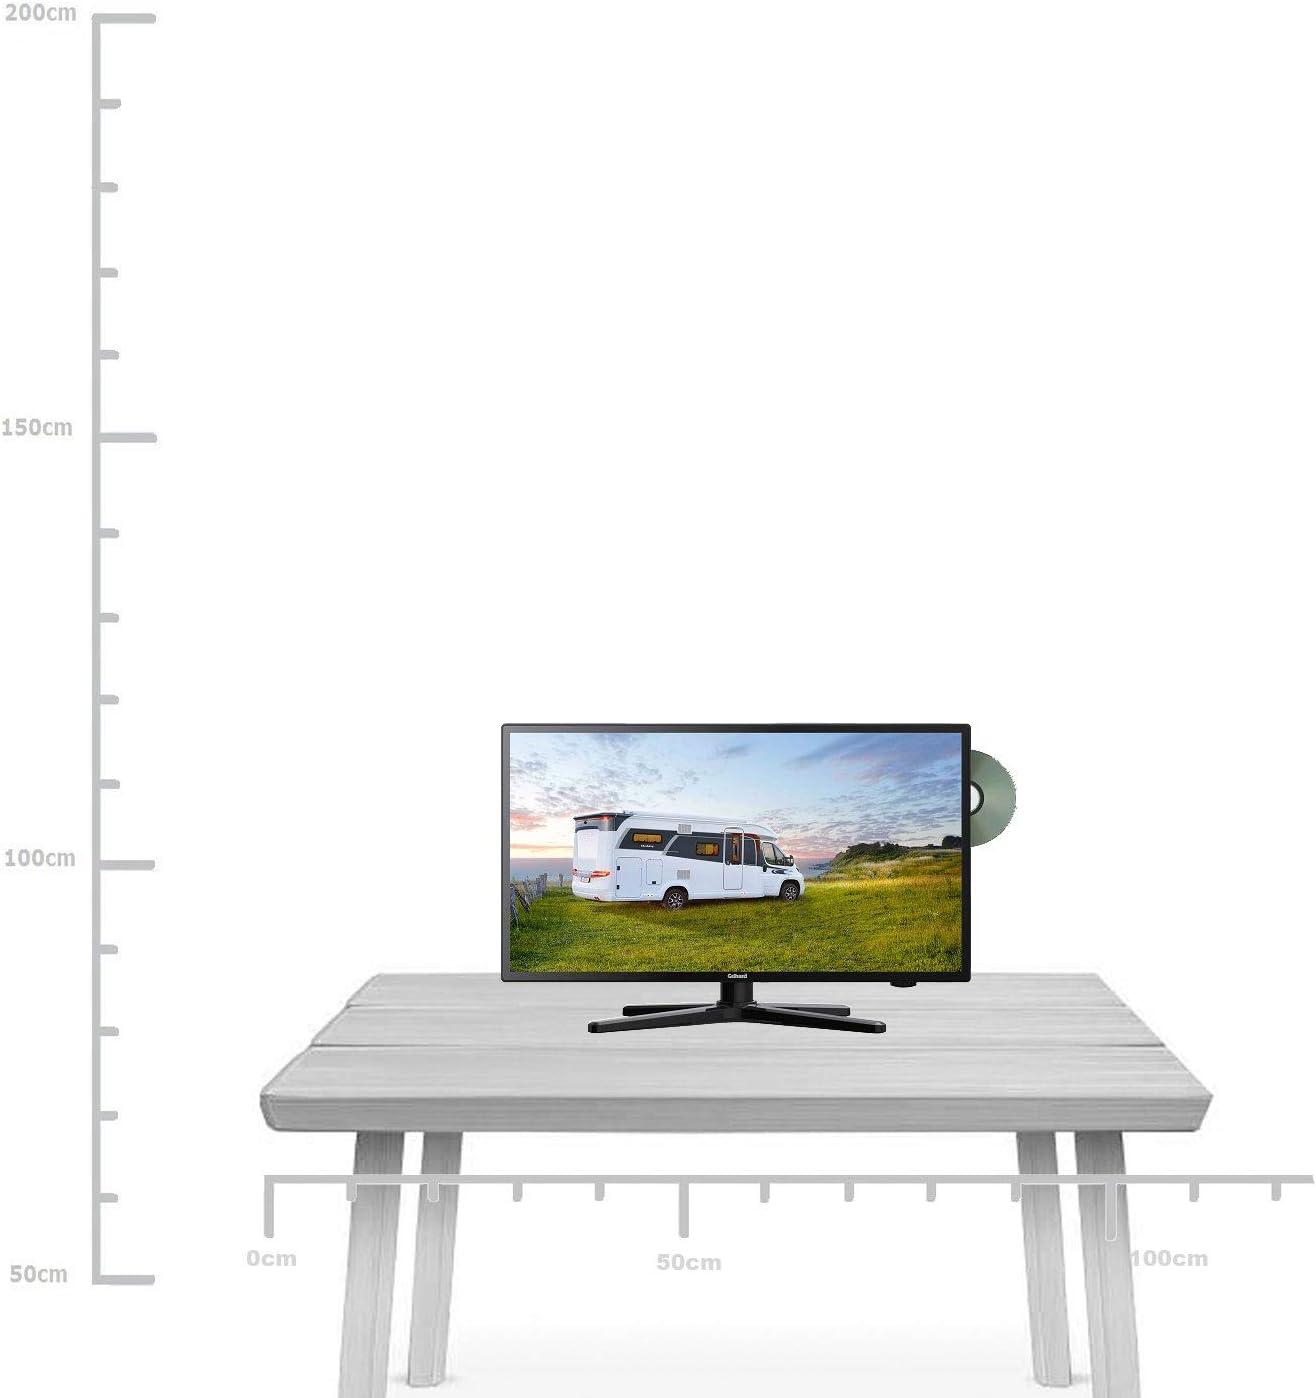 Gelhard GTV de 2482 LED 22 Pulgadas Wide Screen TV DVD DVB-T/S/S2/T2/C 230/12 V 24 V para Caravana Camping Coche camión Truck y Casa: Amazon.es: Electrónica